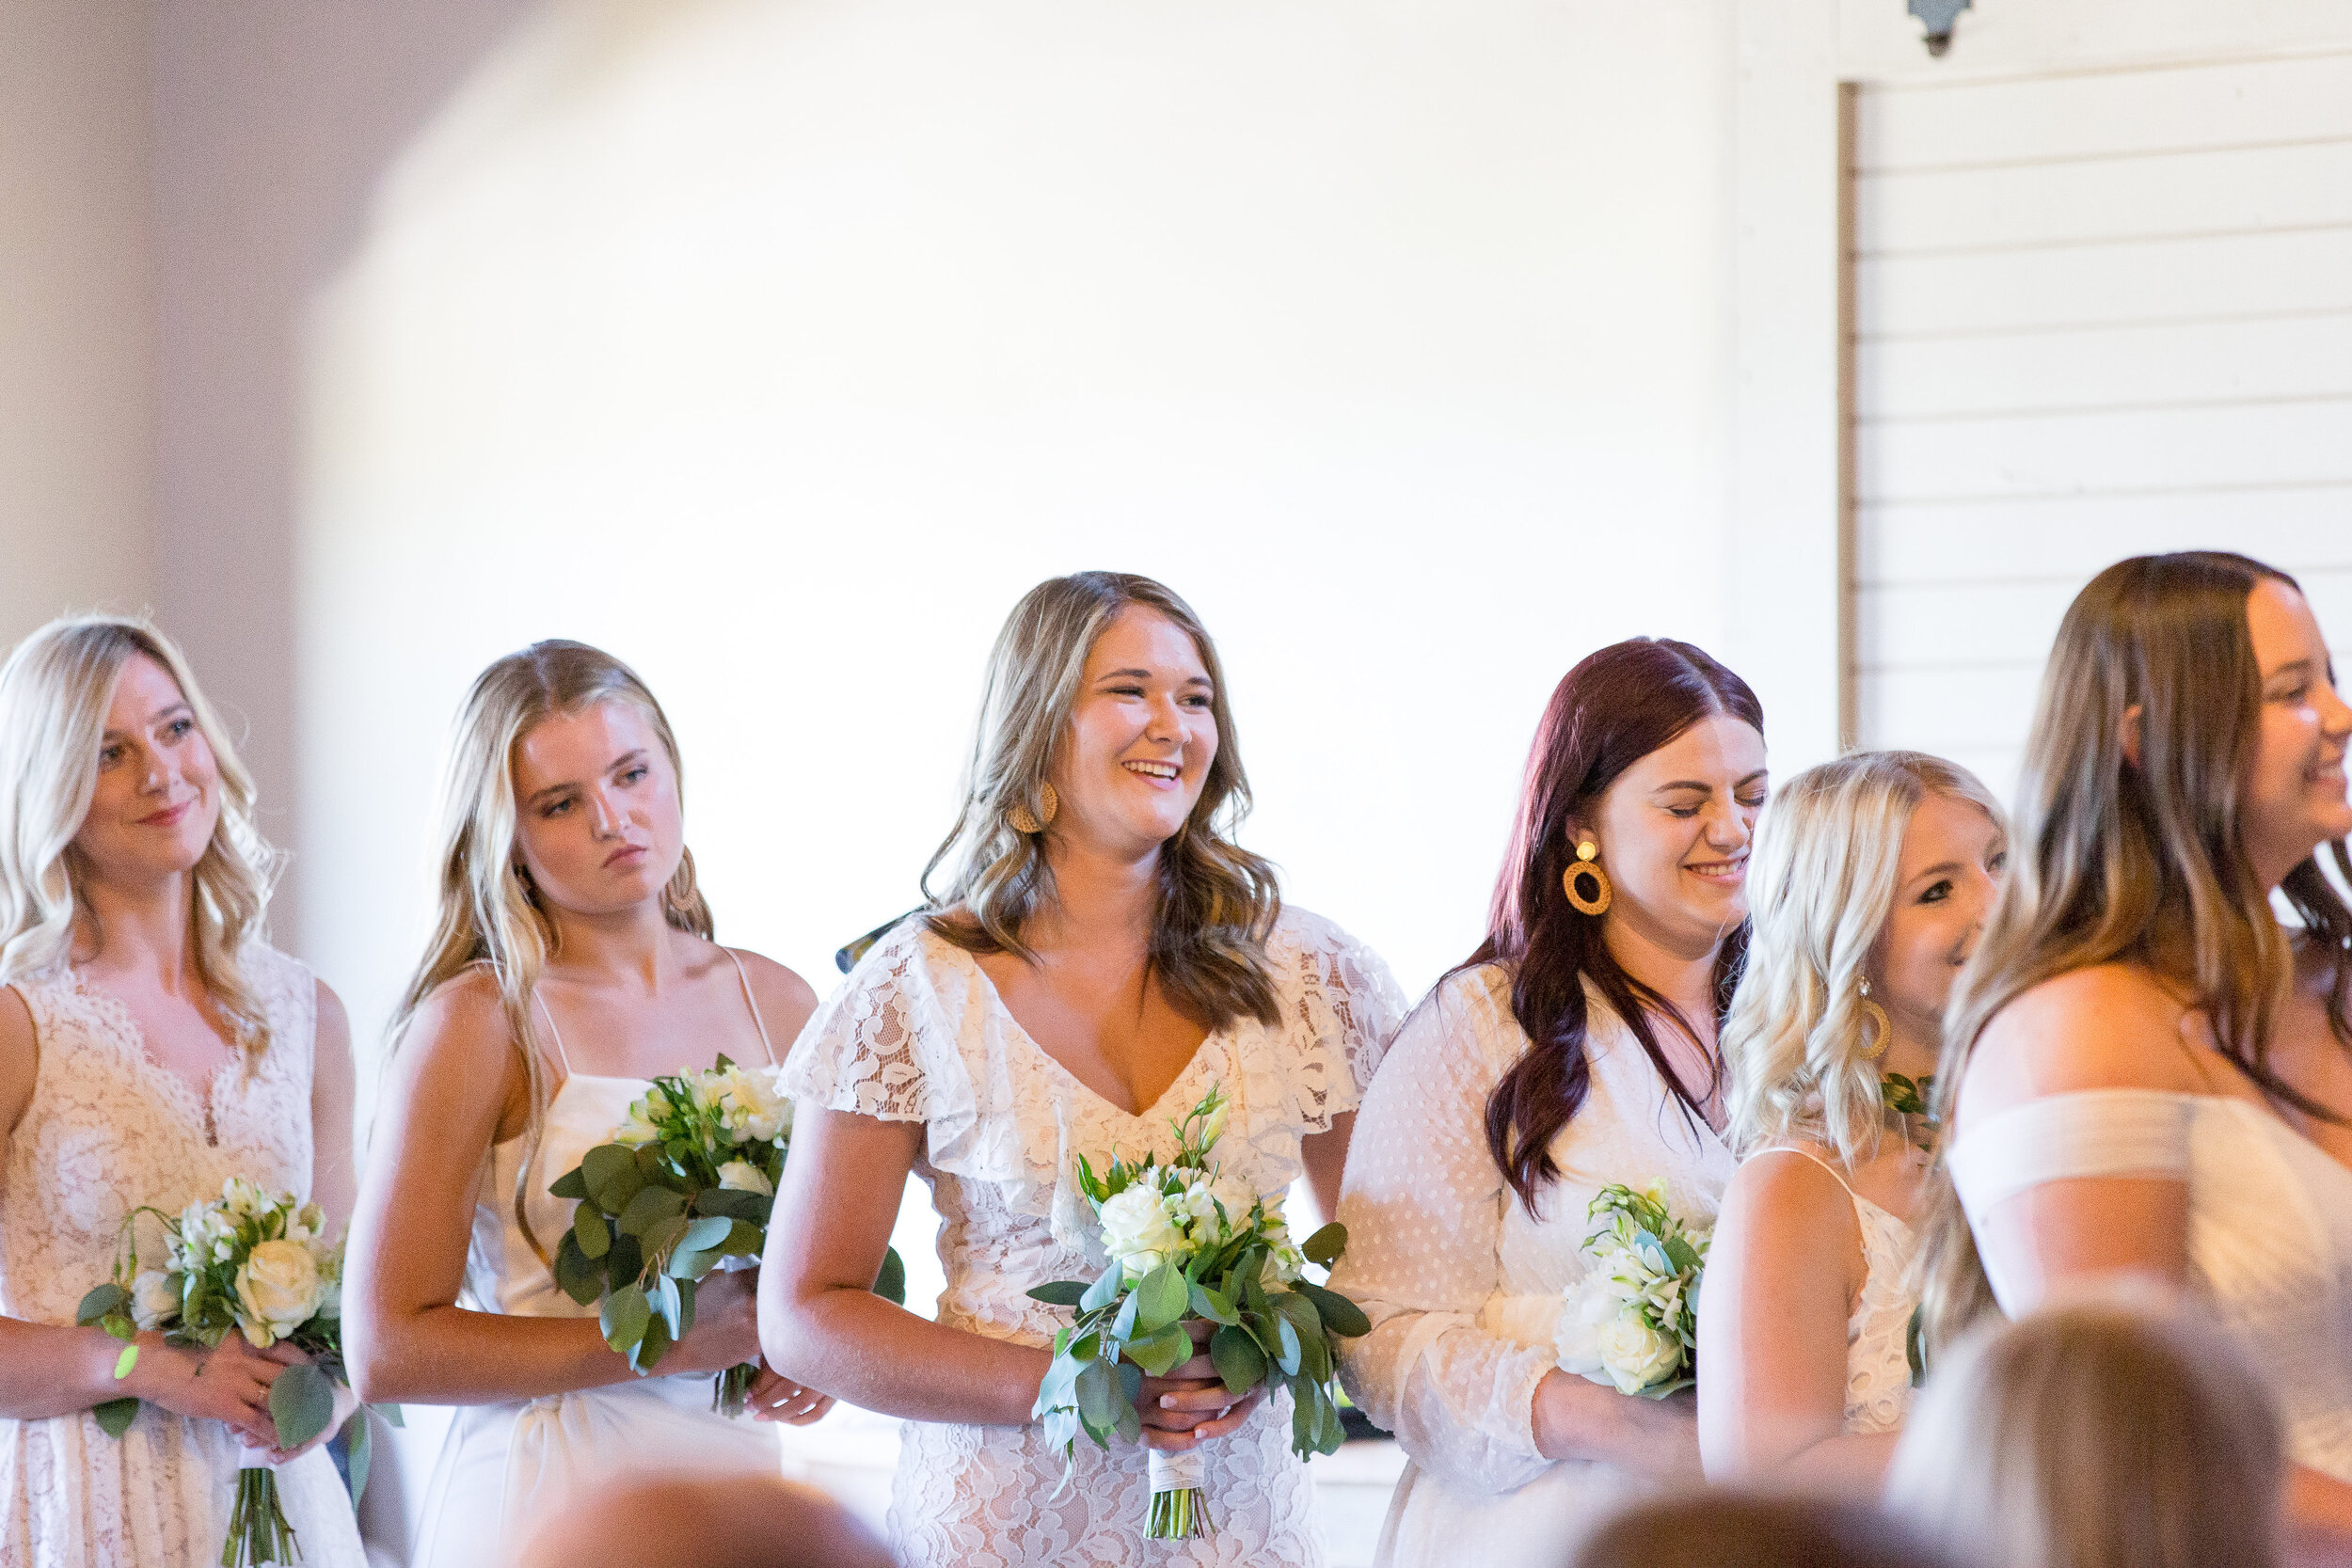 spokane bridesmaids wedding ceremony